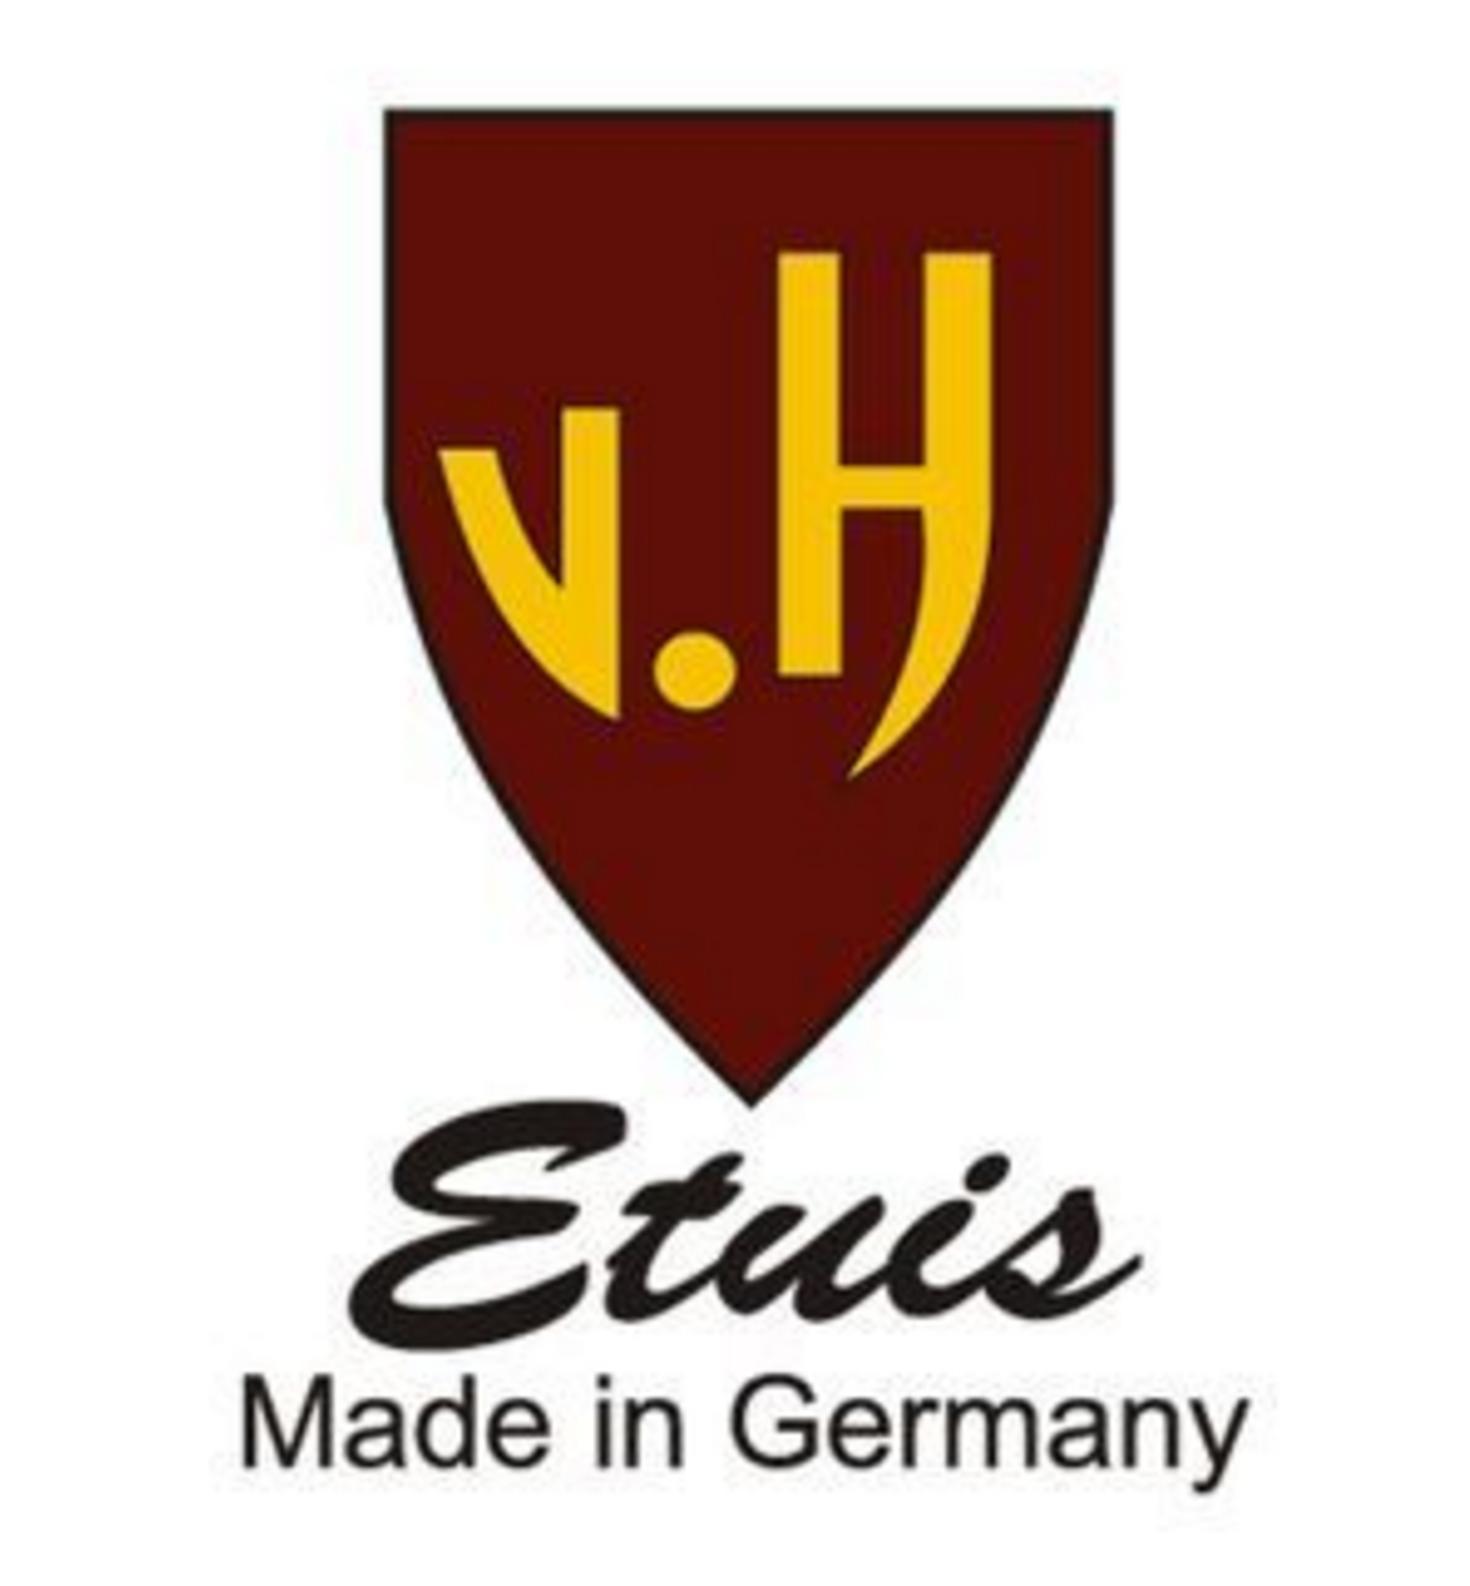 Vom Hofe Carbon - vyrobeno v Německu